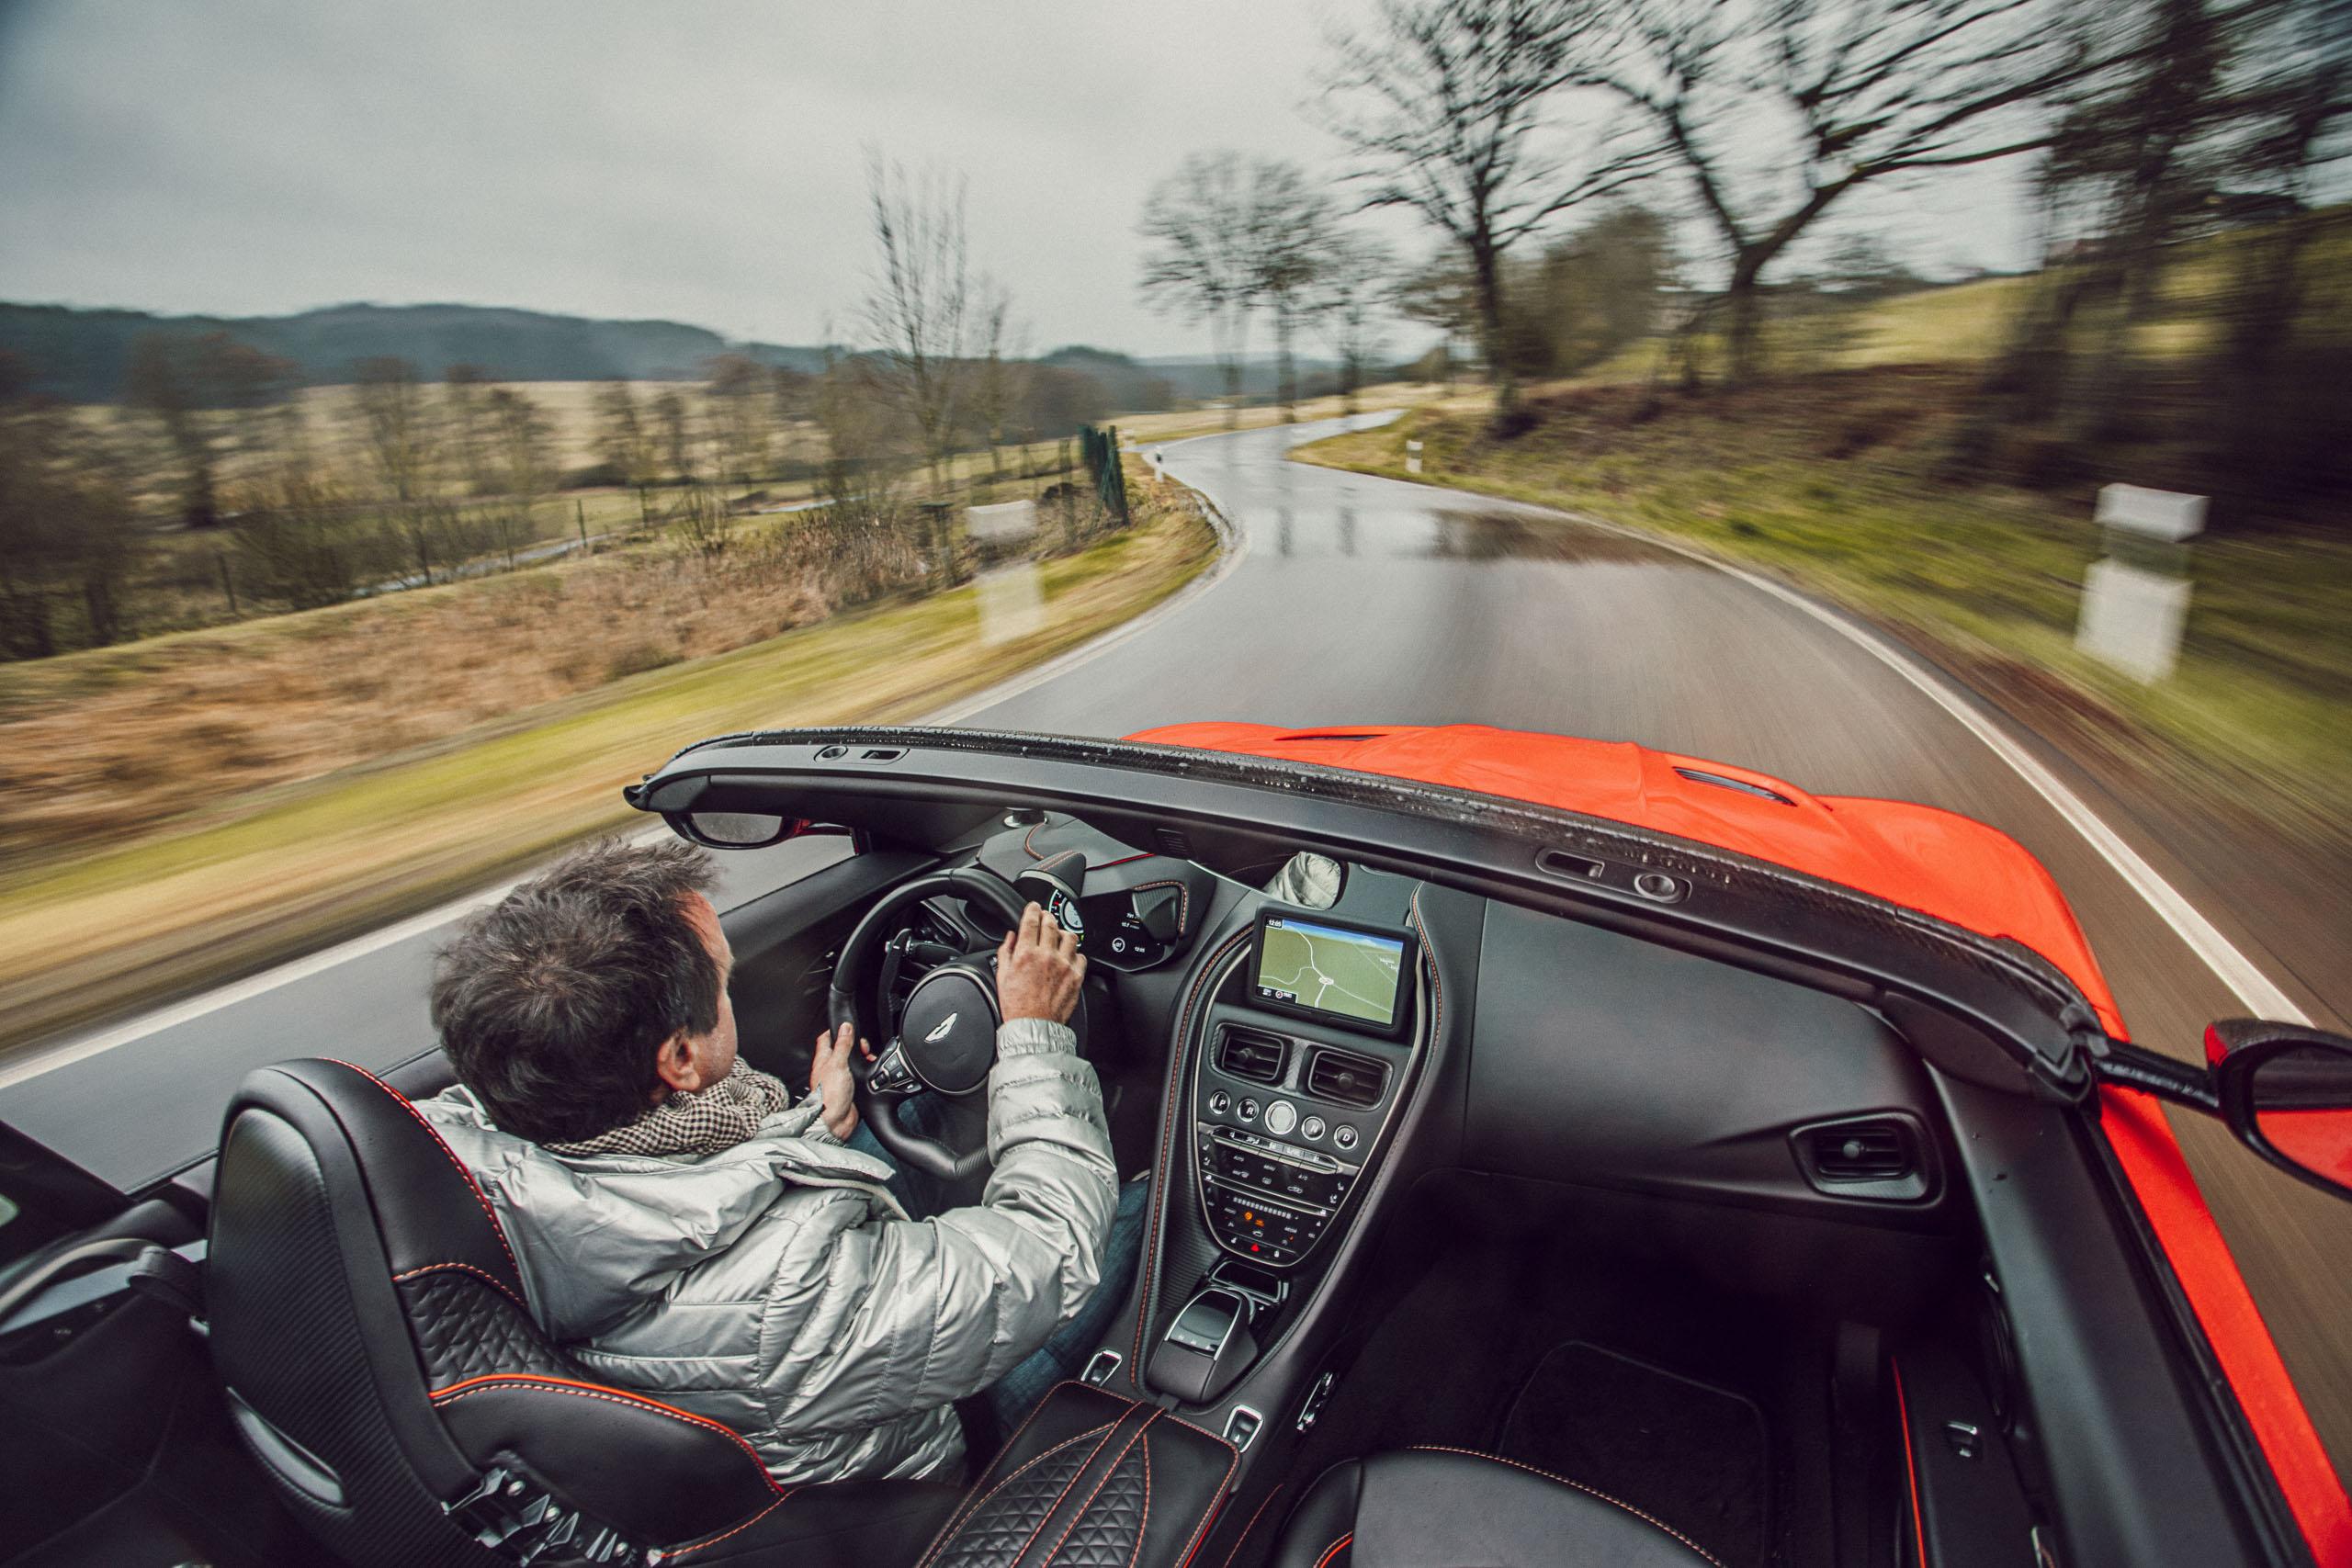 Roter Aston Martin Geneva während Regen bei der Fahrt Innenraum